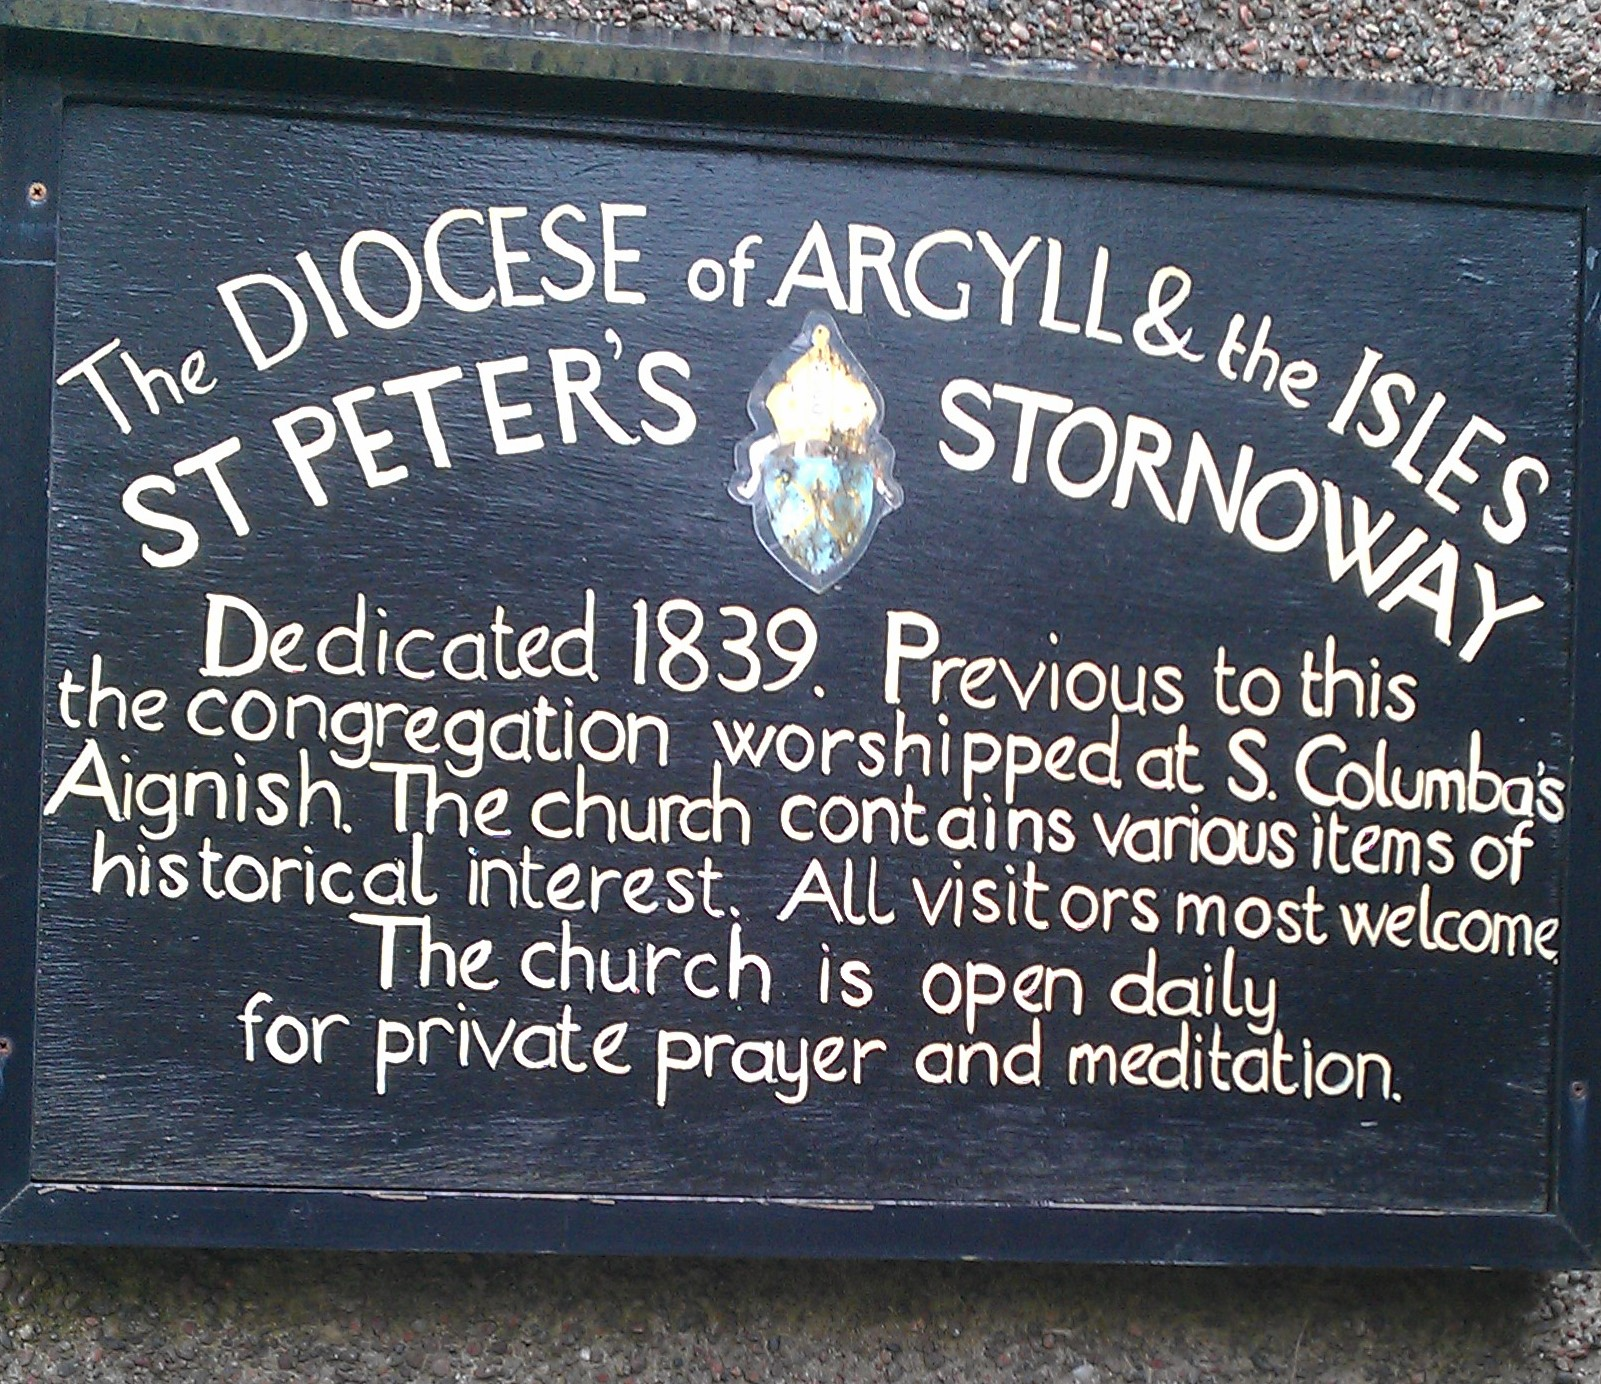 St Peter's Stornoway sign